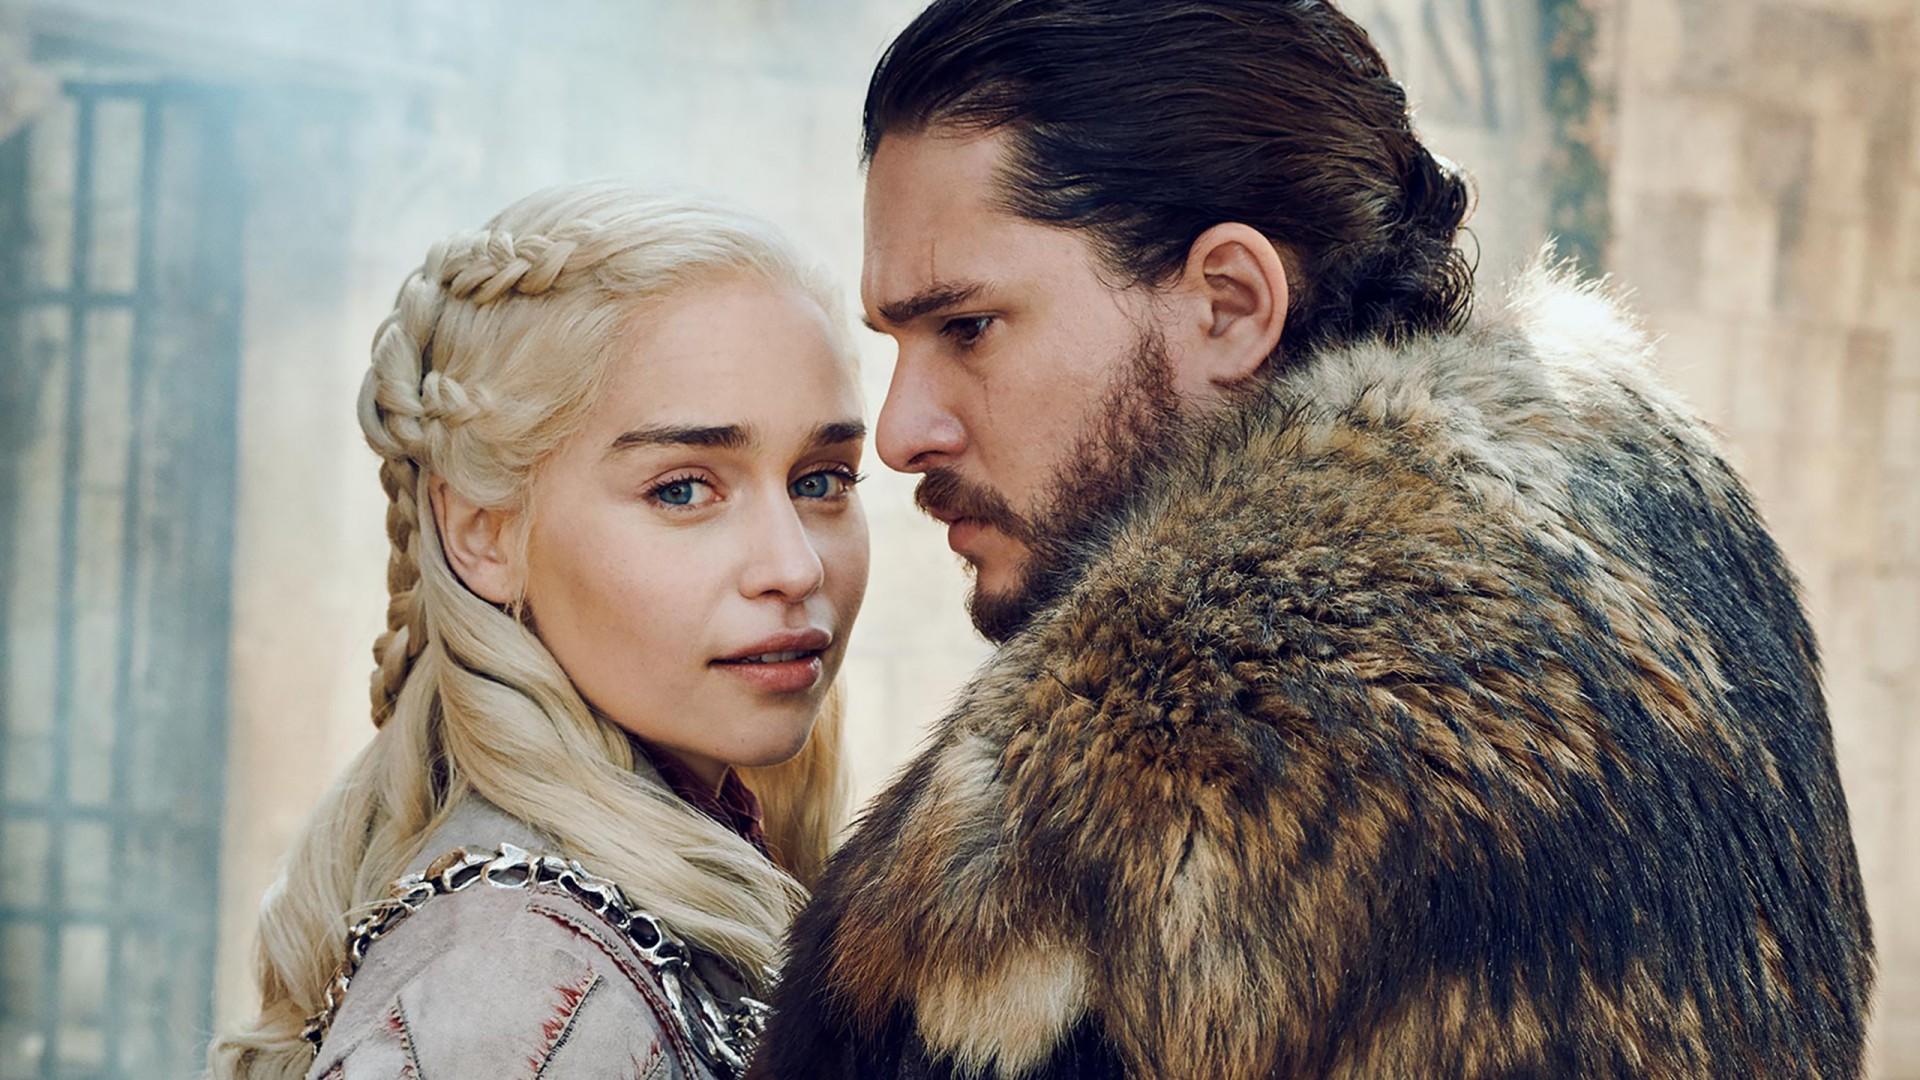 Cute Love Couple Kissing Wallpaper Jon Snow Daenerys Targaryen In Got Season 8 Wallpapers